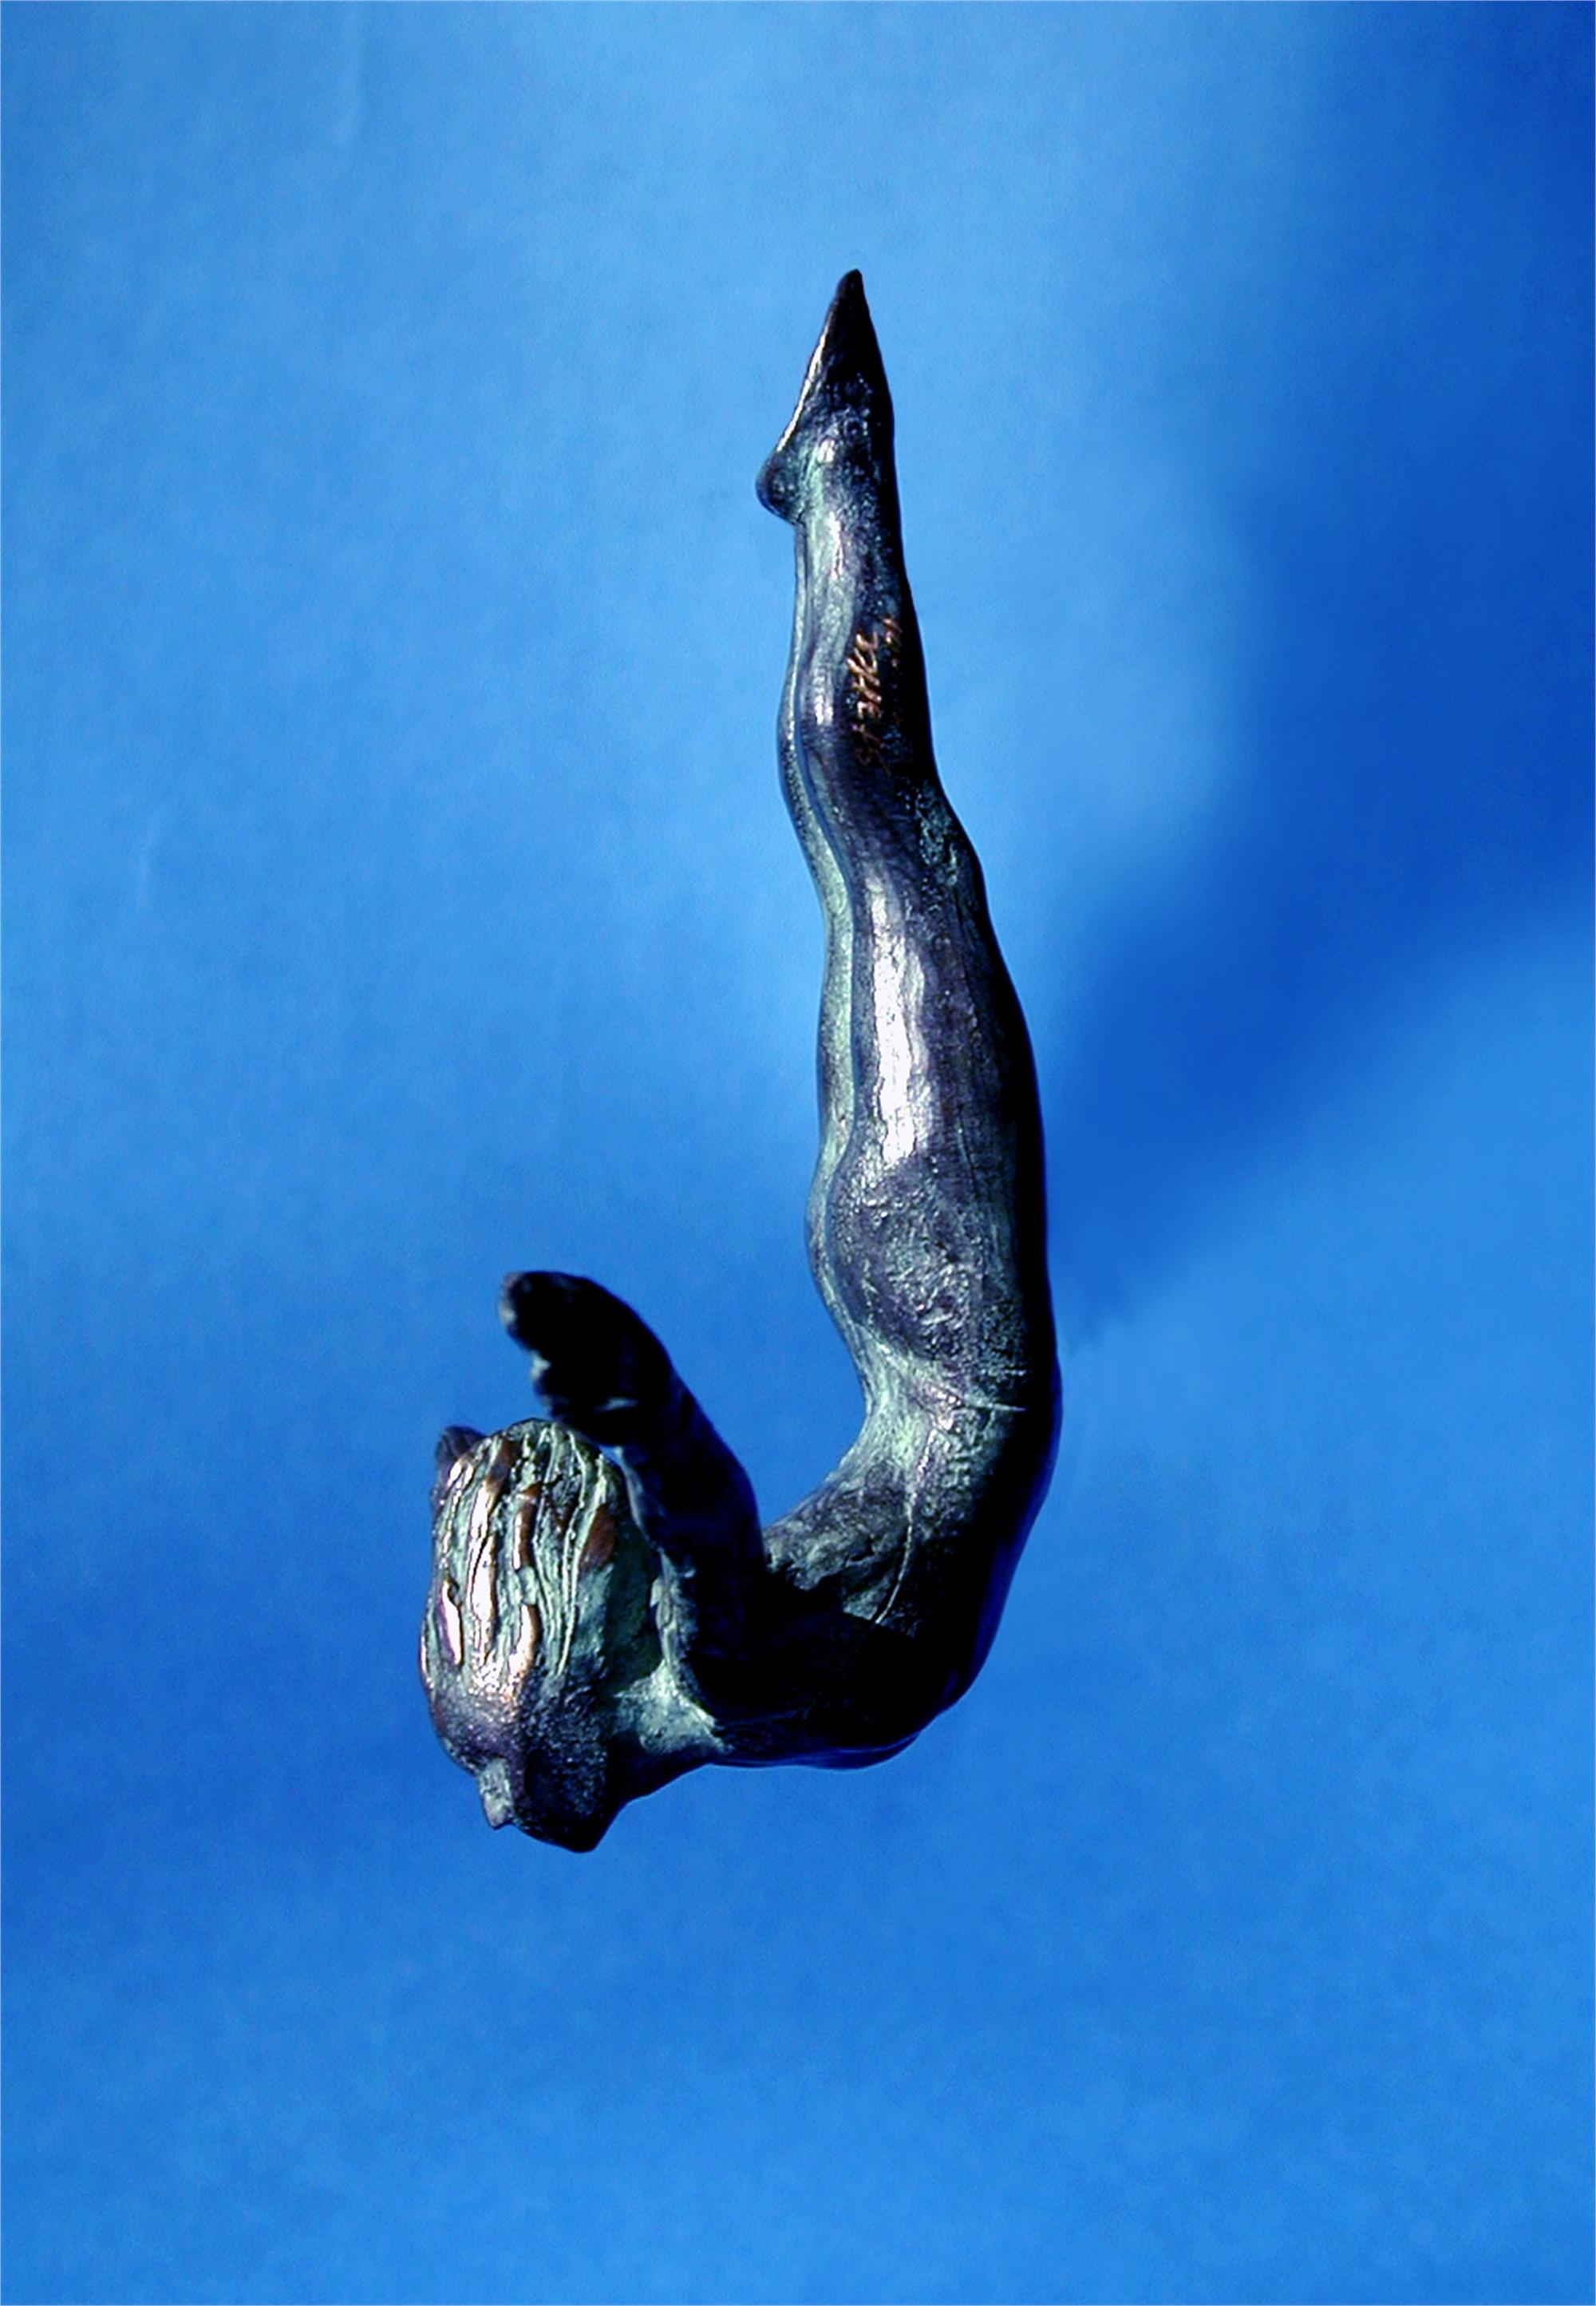 Female Skydiver by Bill Starke